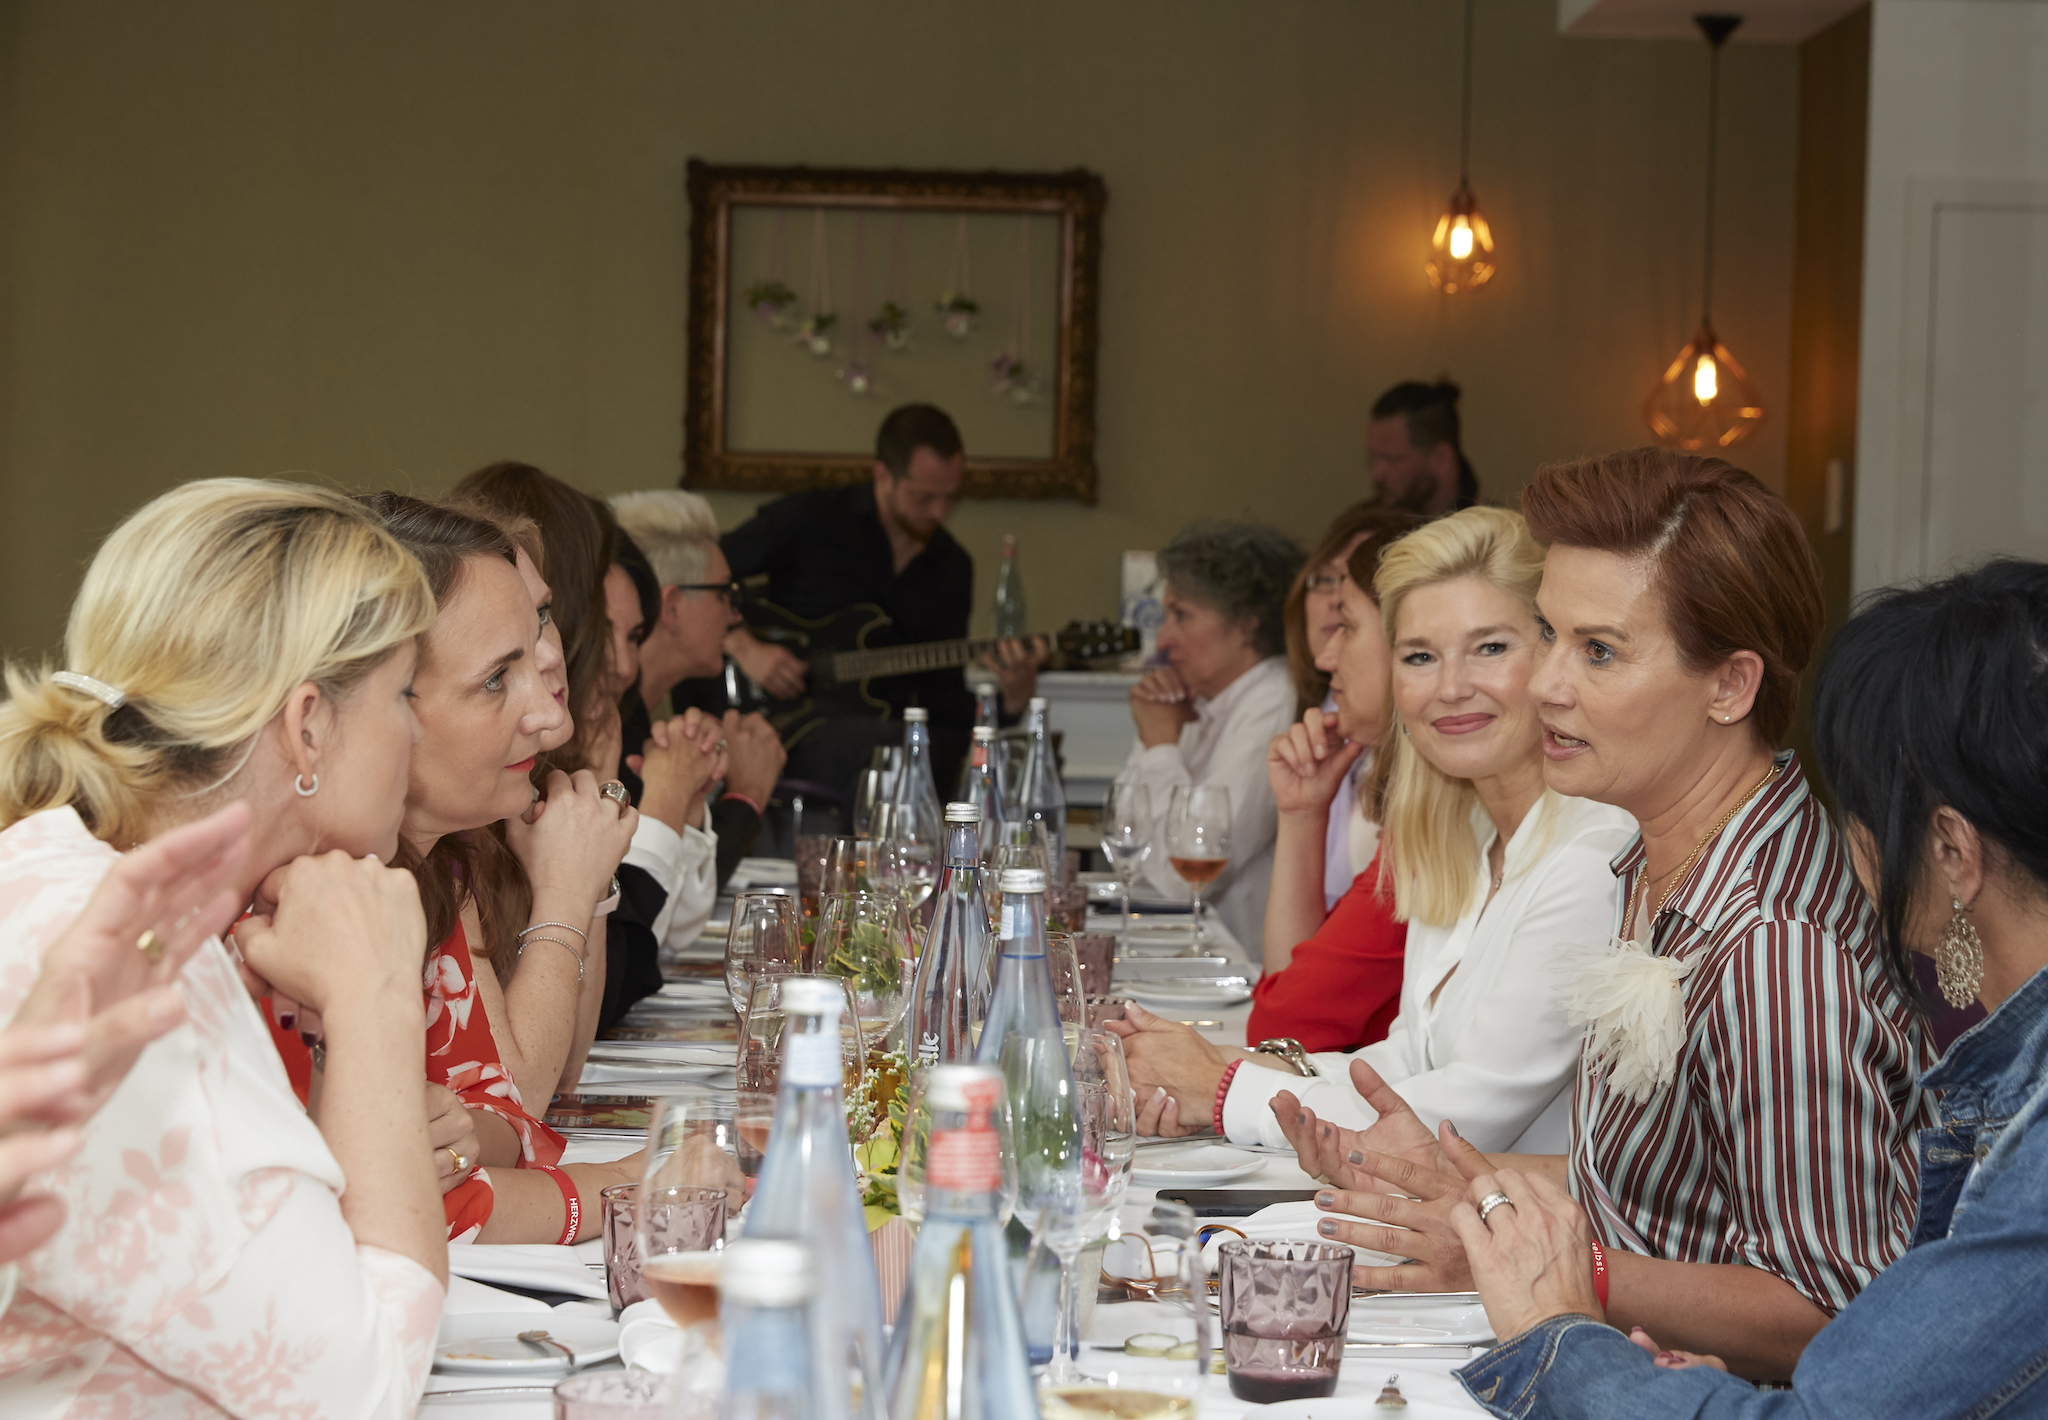 Herzwerk Ladies Lunch, Jenny Jürgens Herzwerk Lunch, Jenny Jürgens Ladies Lunch, Lifest-Blog, Lieblingsstil.com,